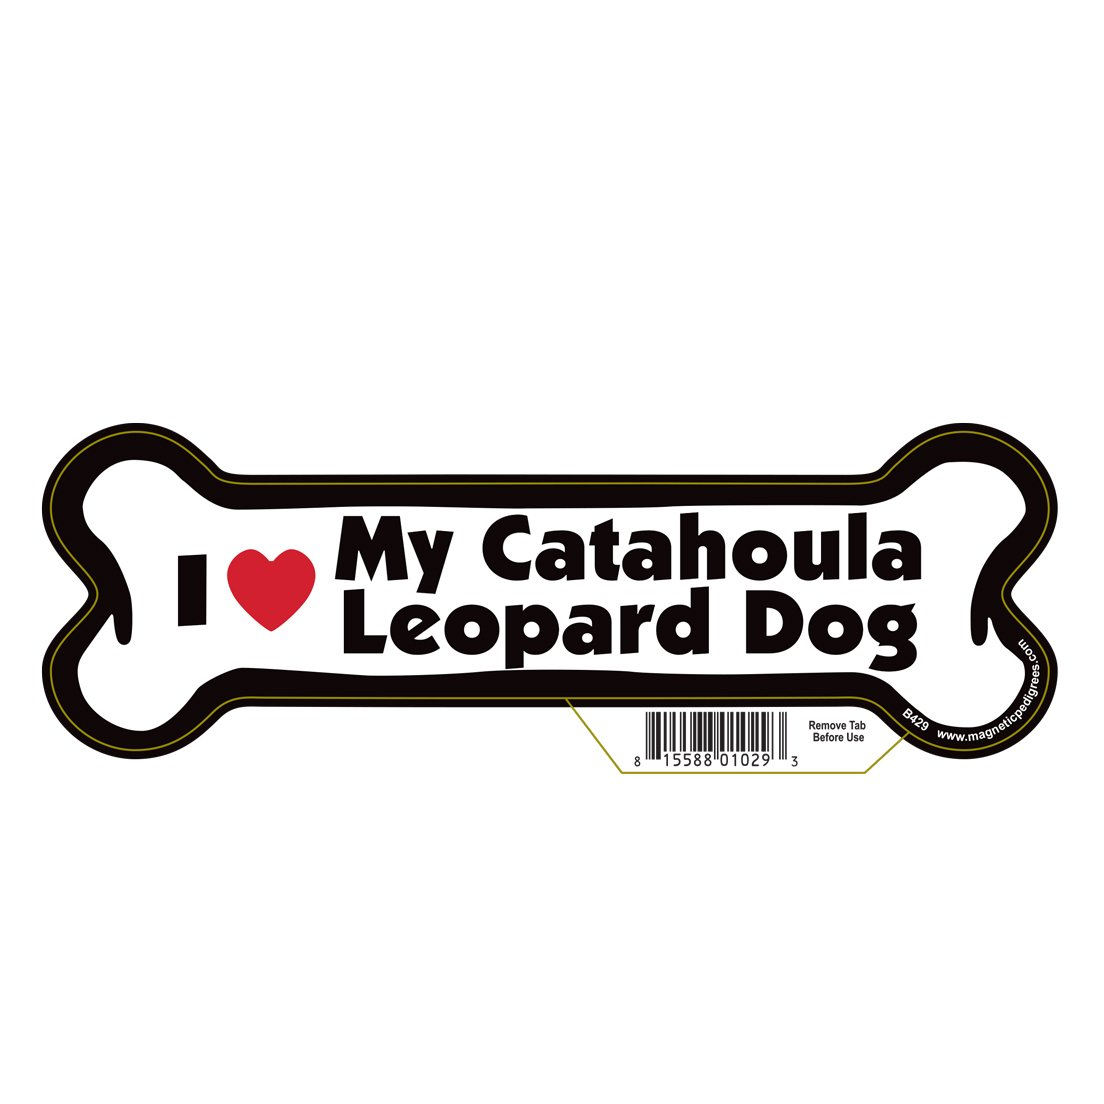 Catahoula Leopard Dog Dog Bone Magnet